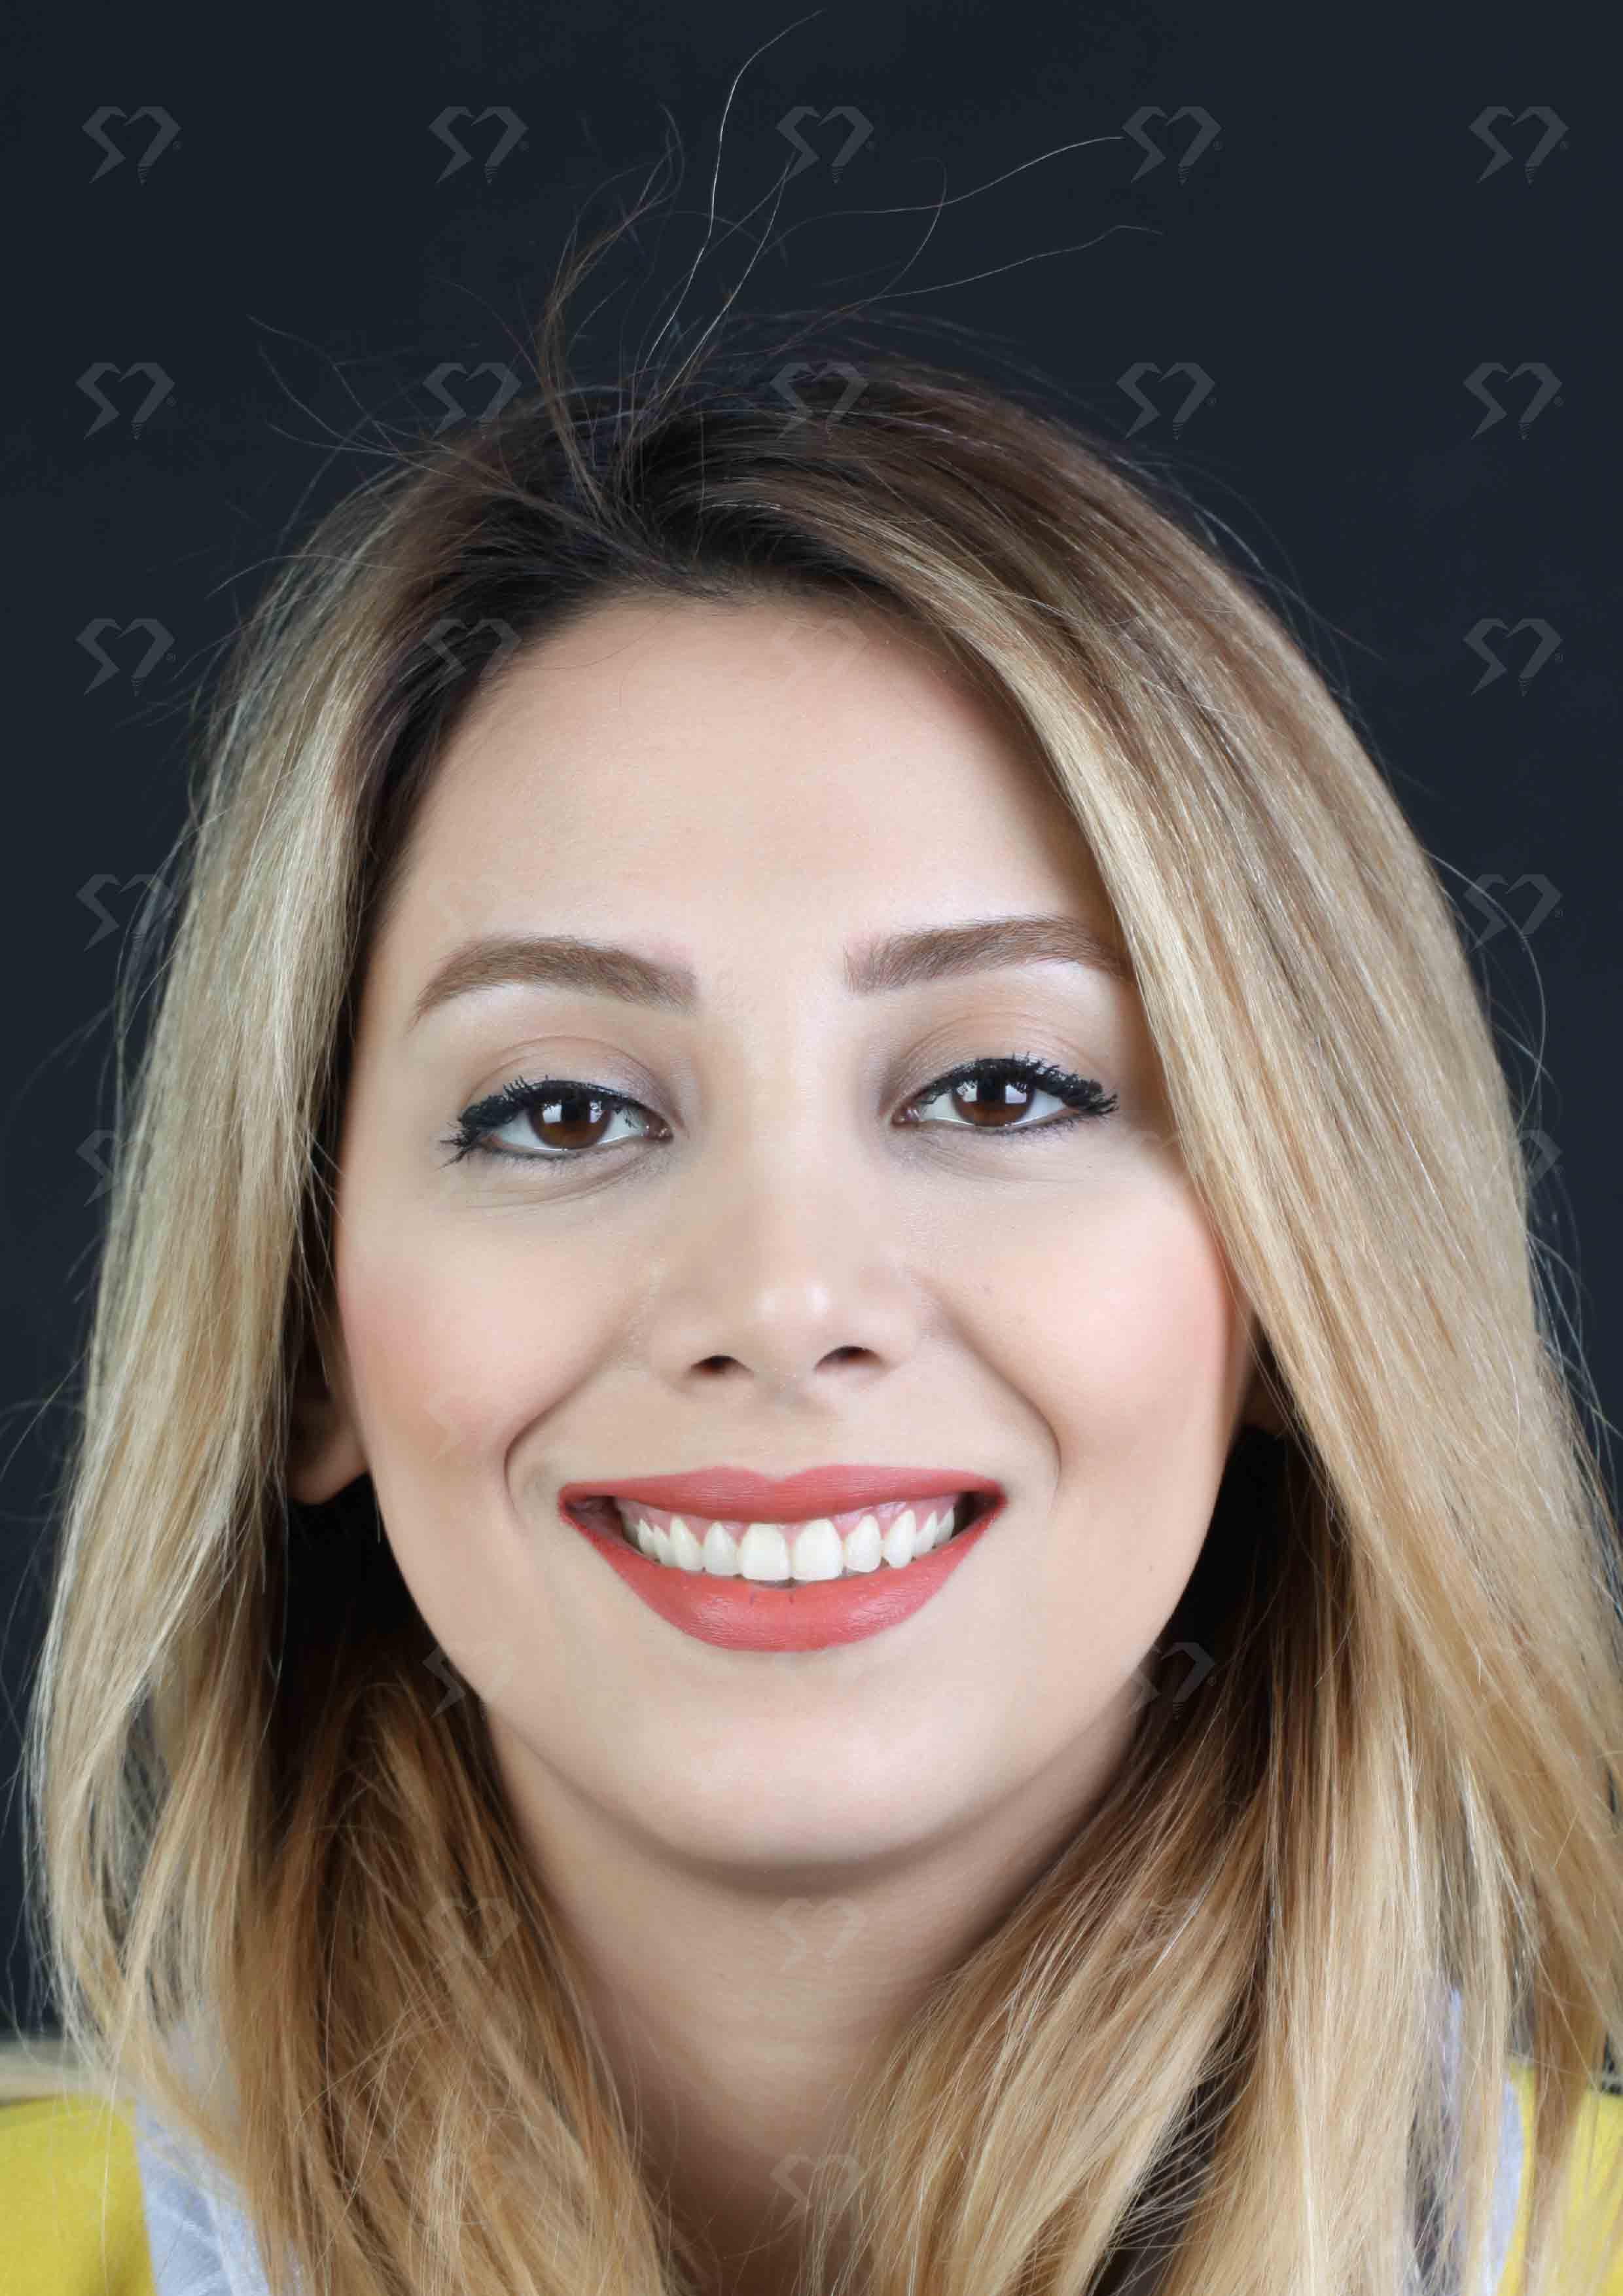 نمونه و کیس جراحی لثه - کلینیک دندانپزشکی دکتر صدری منش